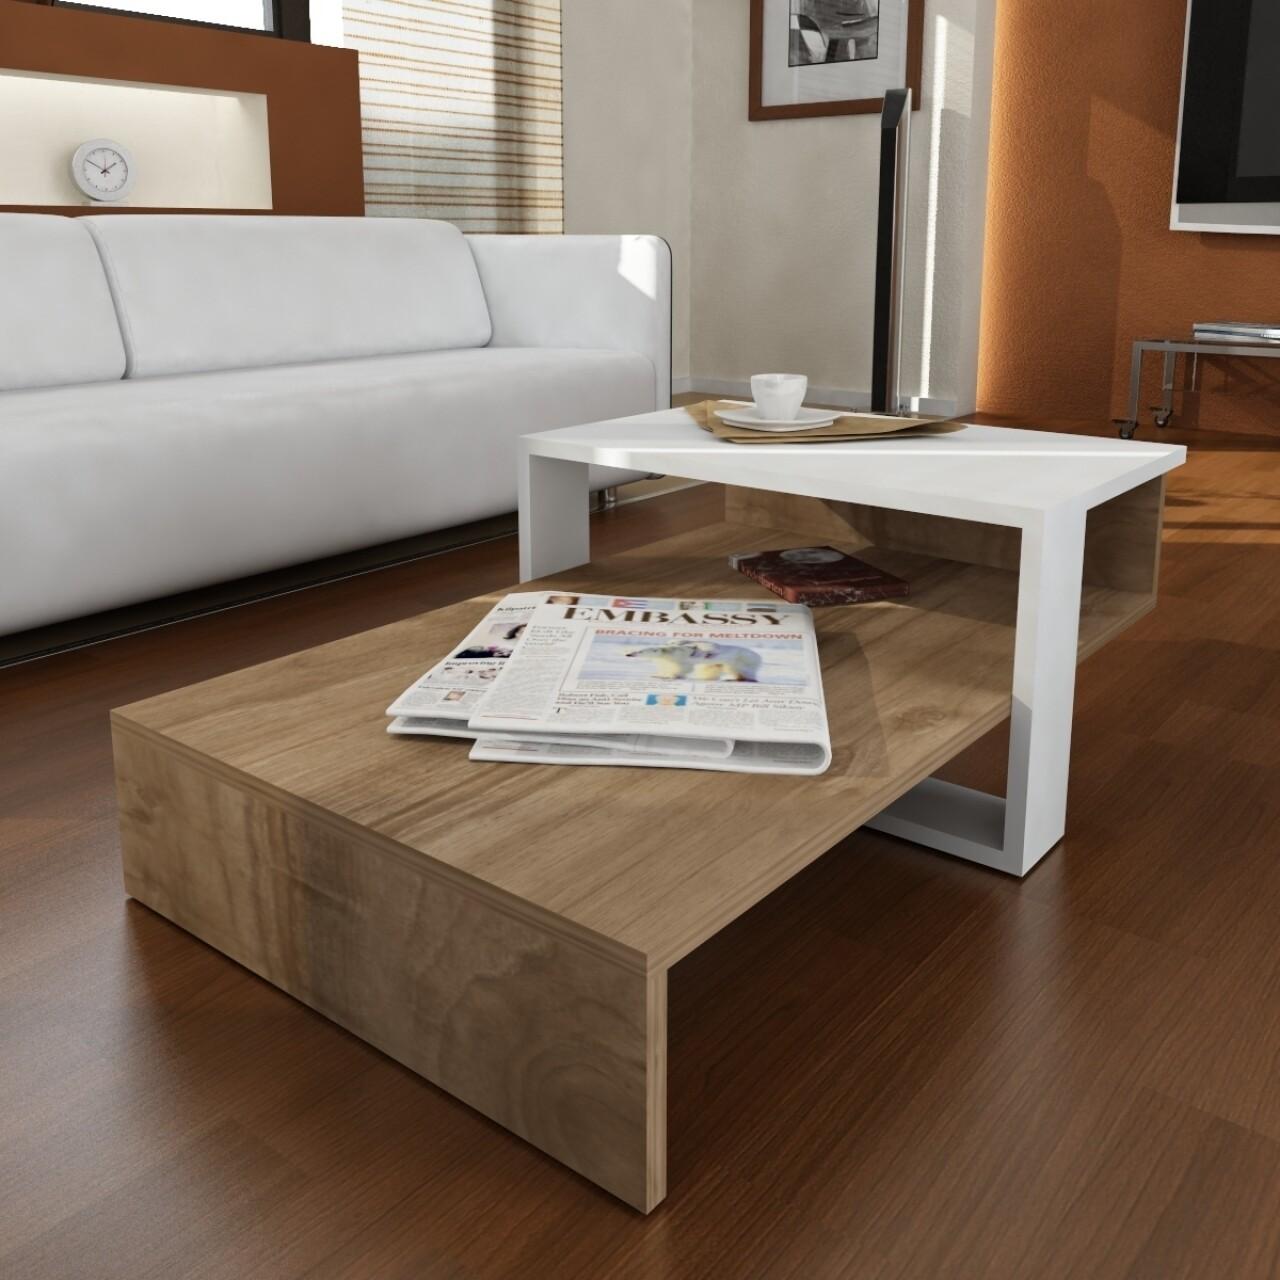 Masuta pentru living, Wooden Art, Chain White Walnut, 80x32.6x43.6 cm